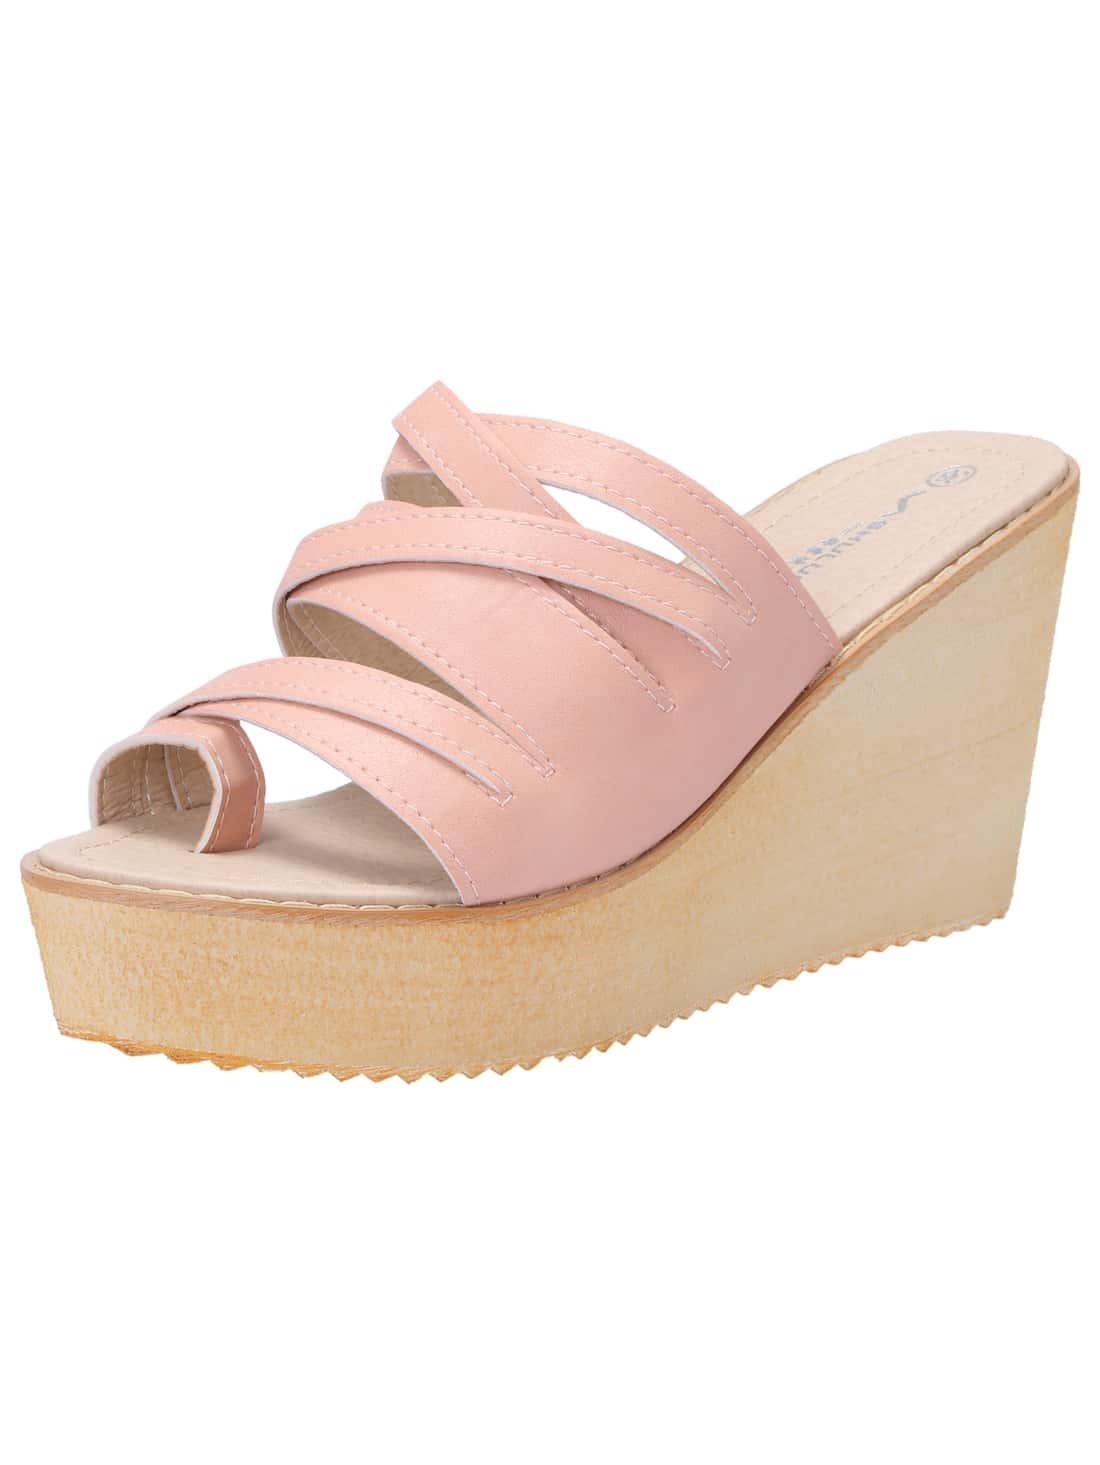 sandalen mit keilabsatz rosa german shein sheinside. Black Bedroom Furniture Sets. Home Design Ideas